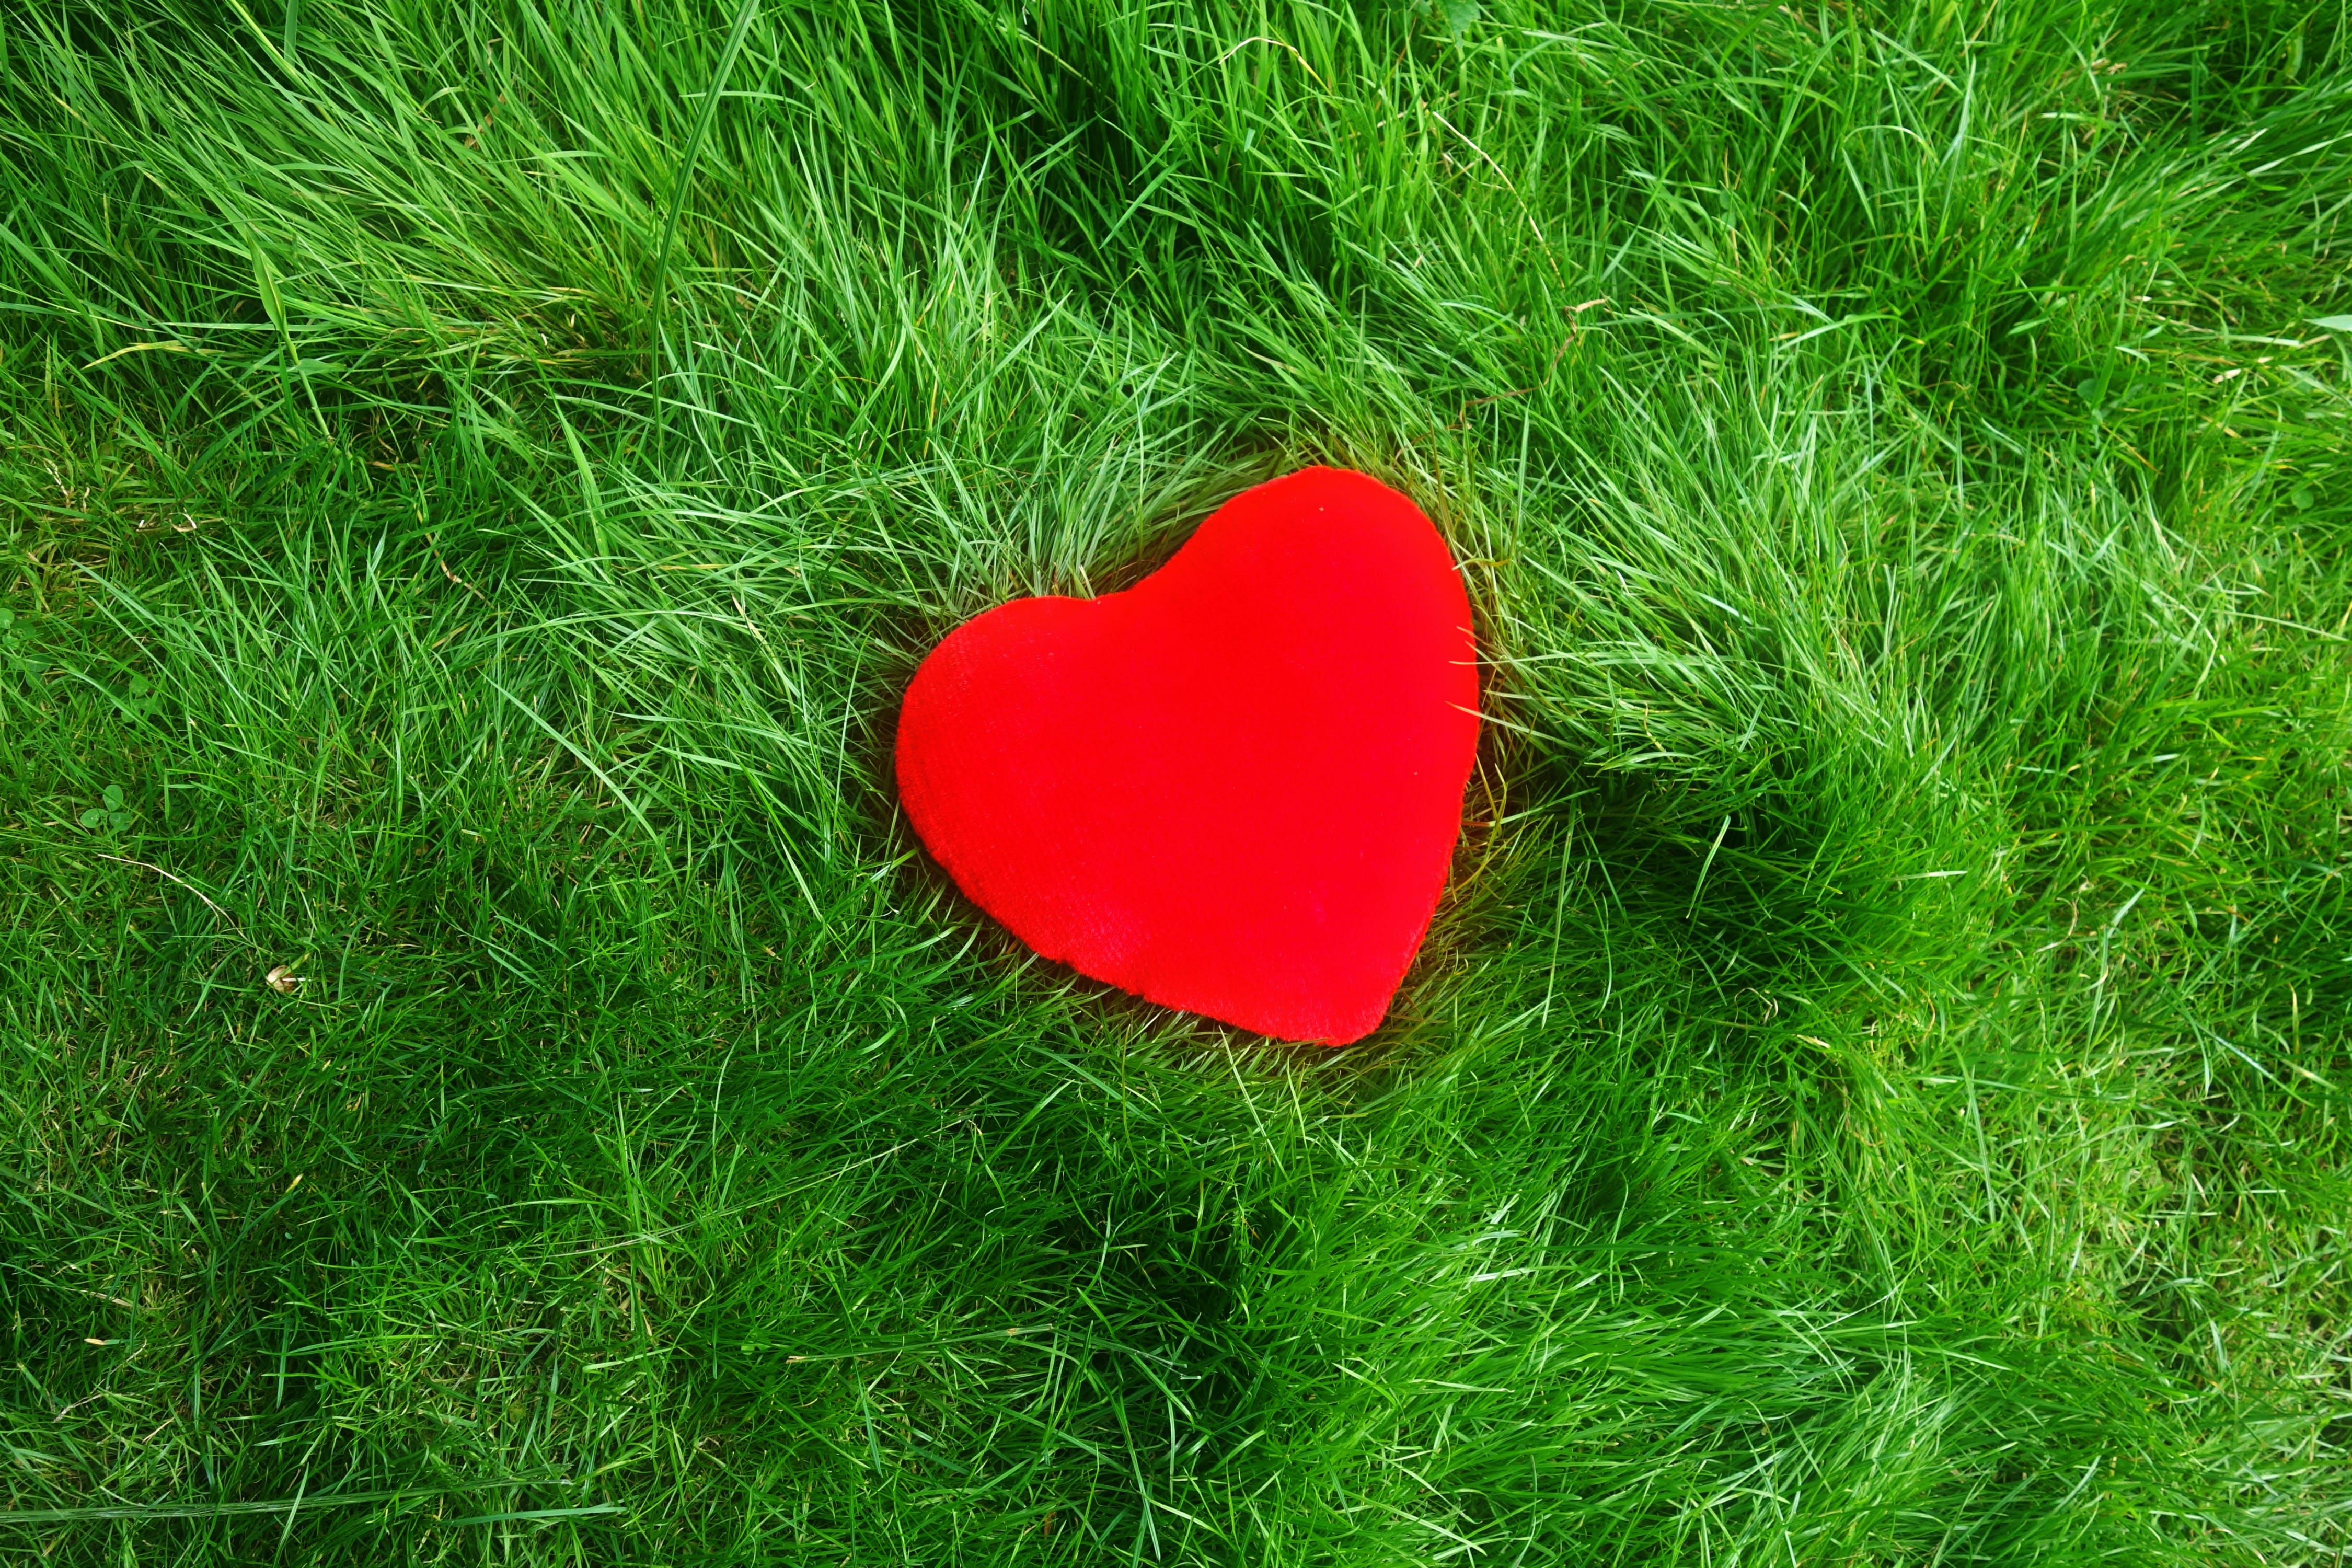 of heart, love, romance, romantic